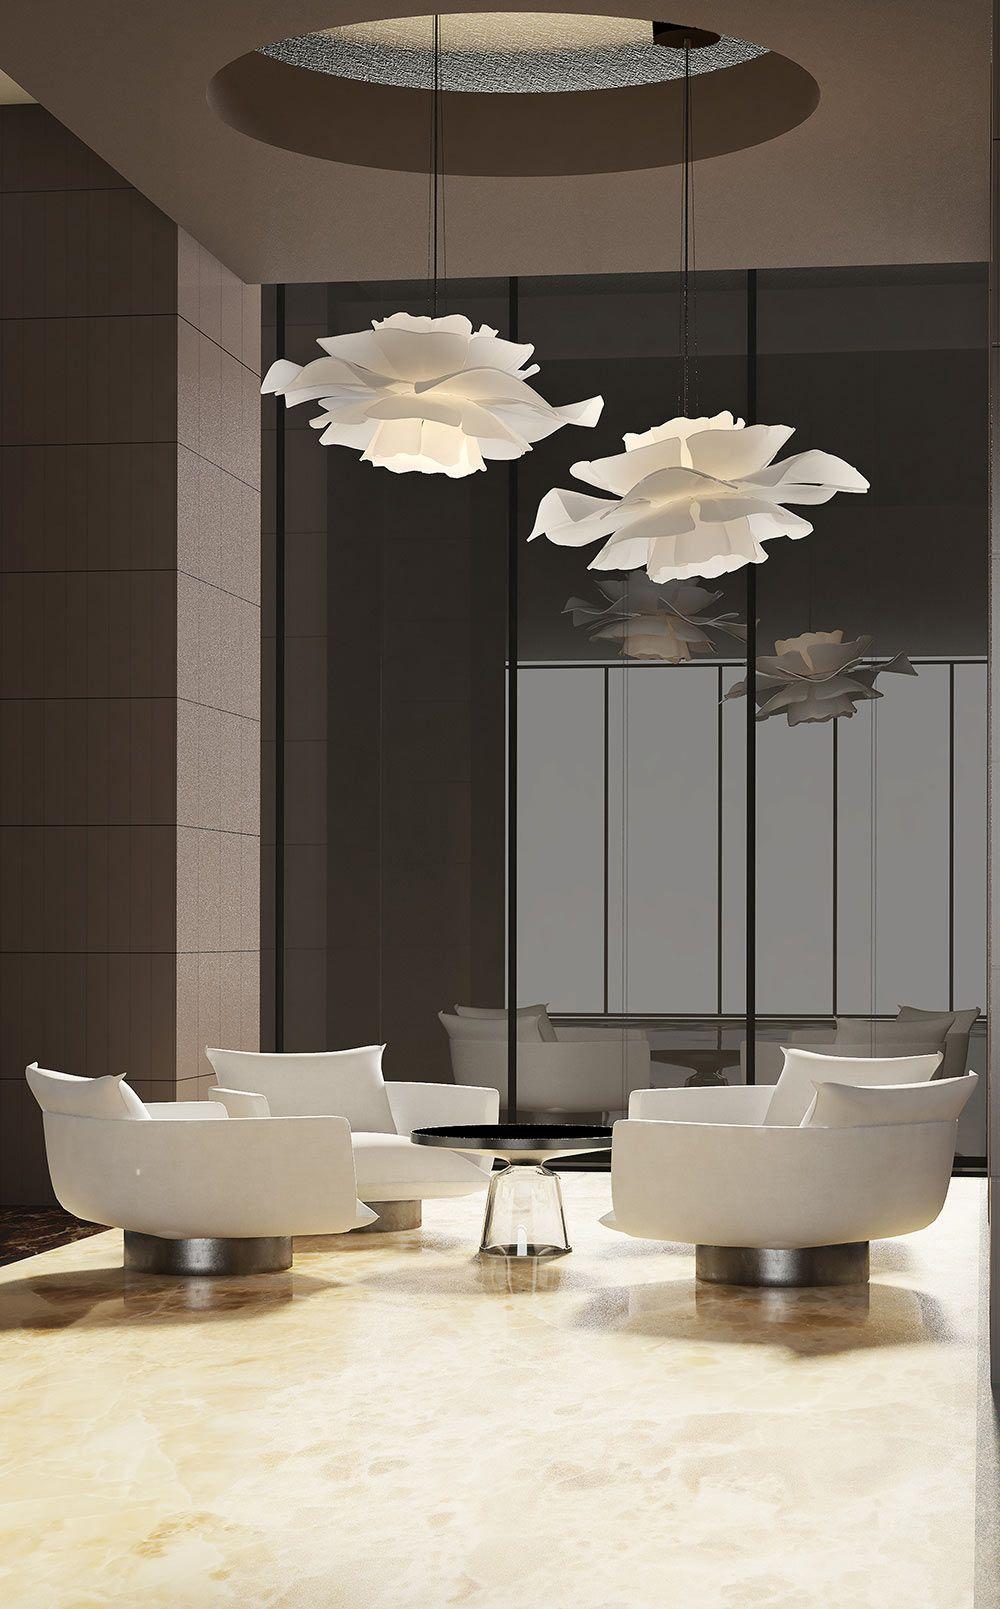 A Look At The Design Process Of Juniper S Love Me Not Pendant Best Home Interior Design Traditional Interior Design Decor Interior Design